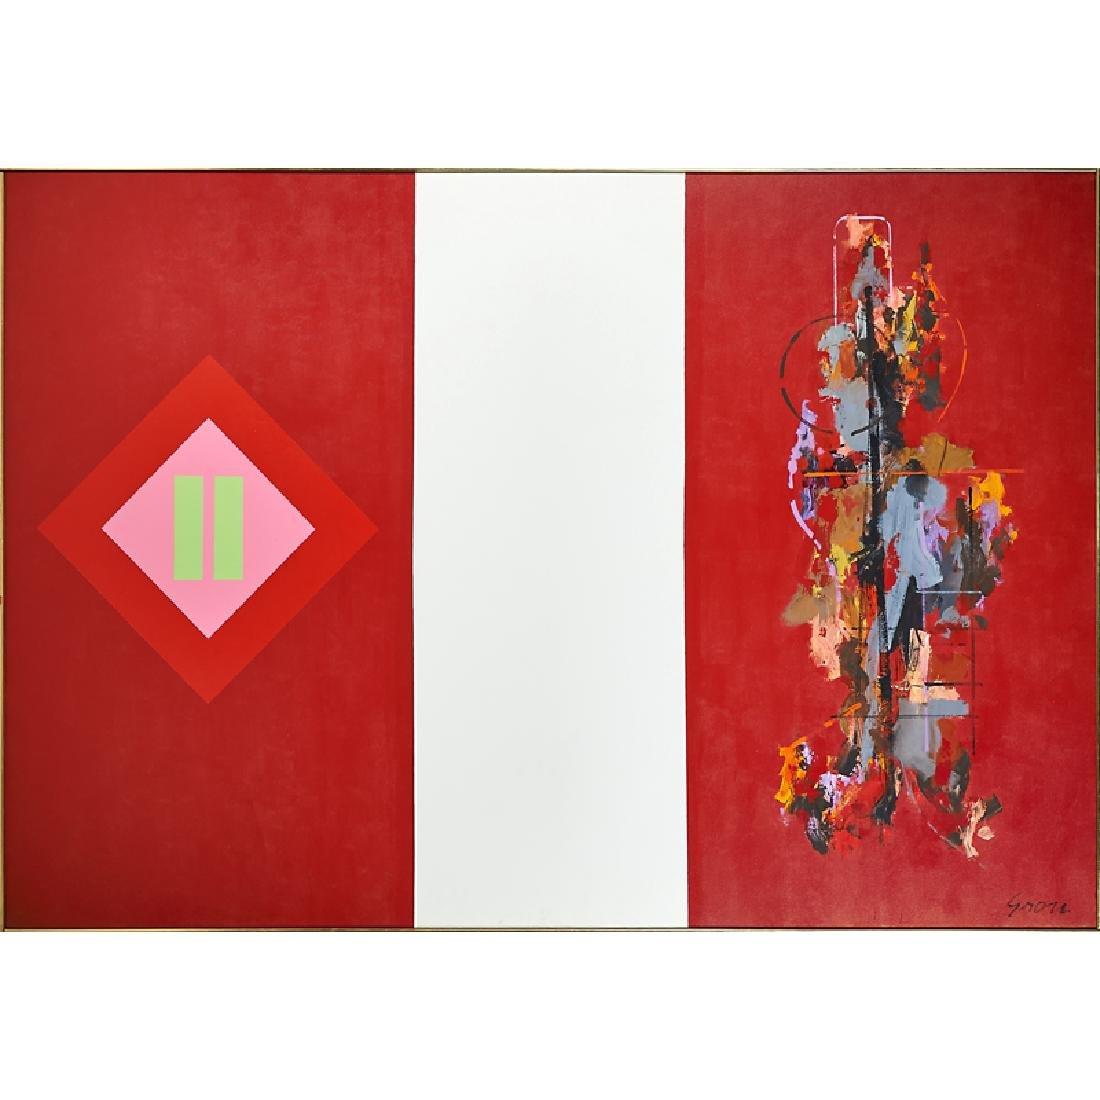 SIDNEY GROSS (American, 1921-1969)